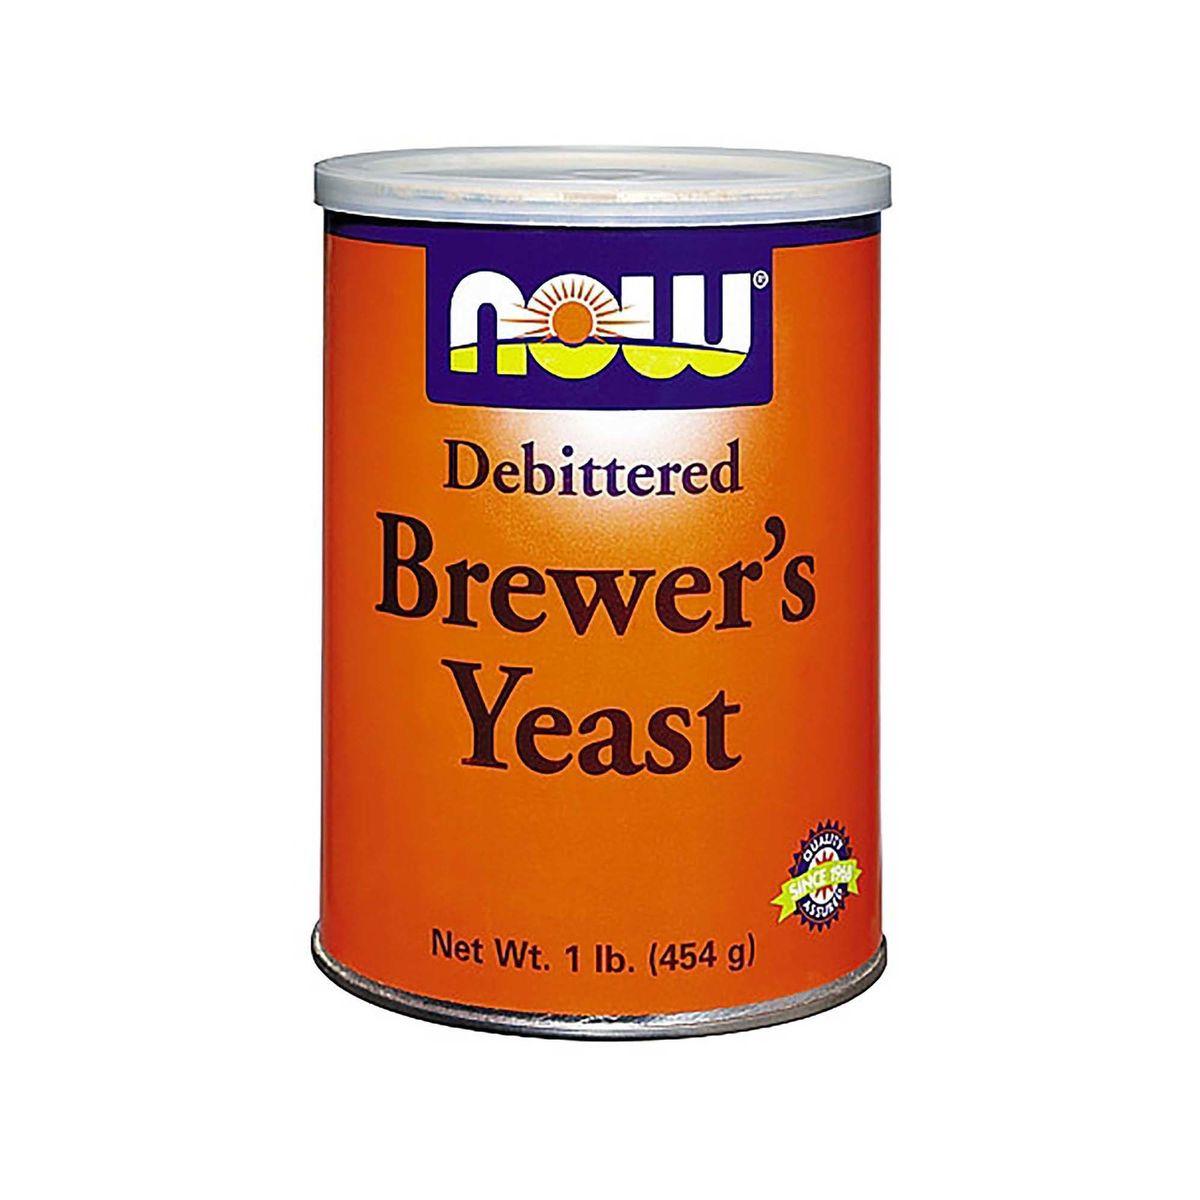 Debittered Brewer's Yeast